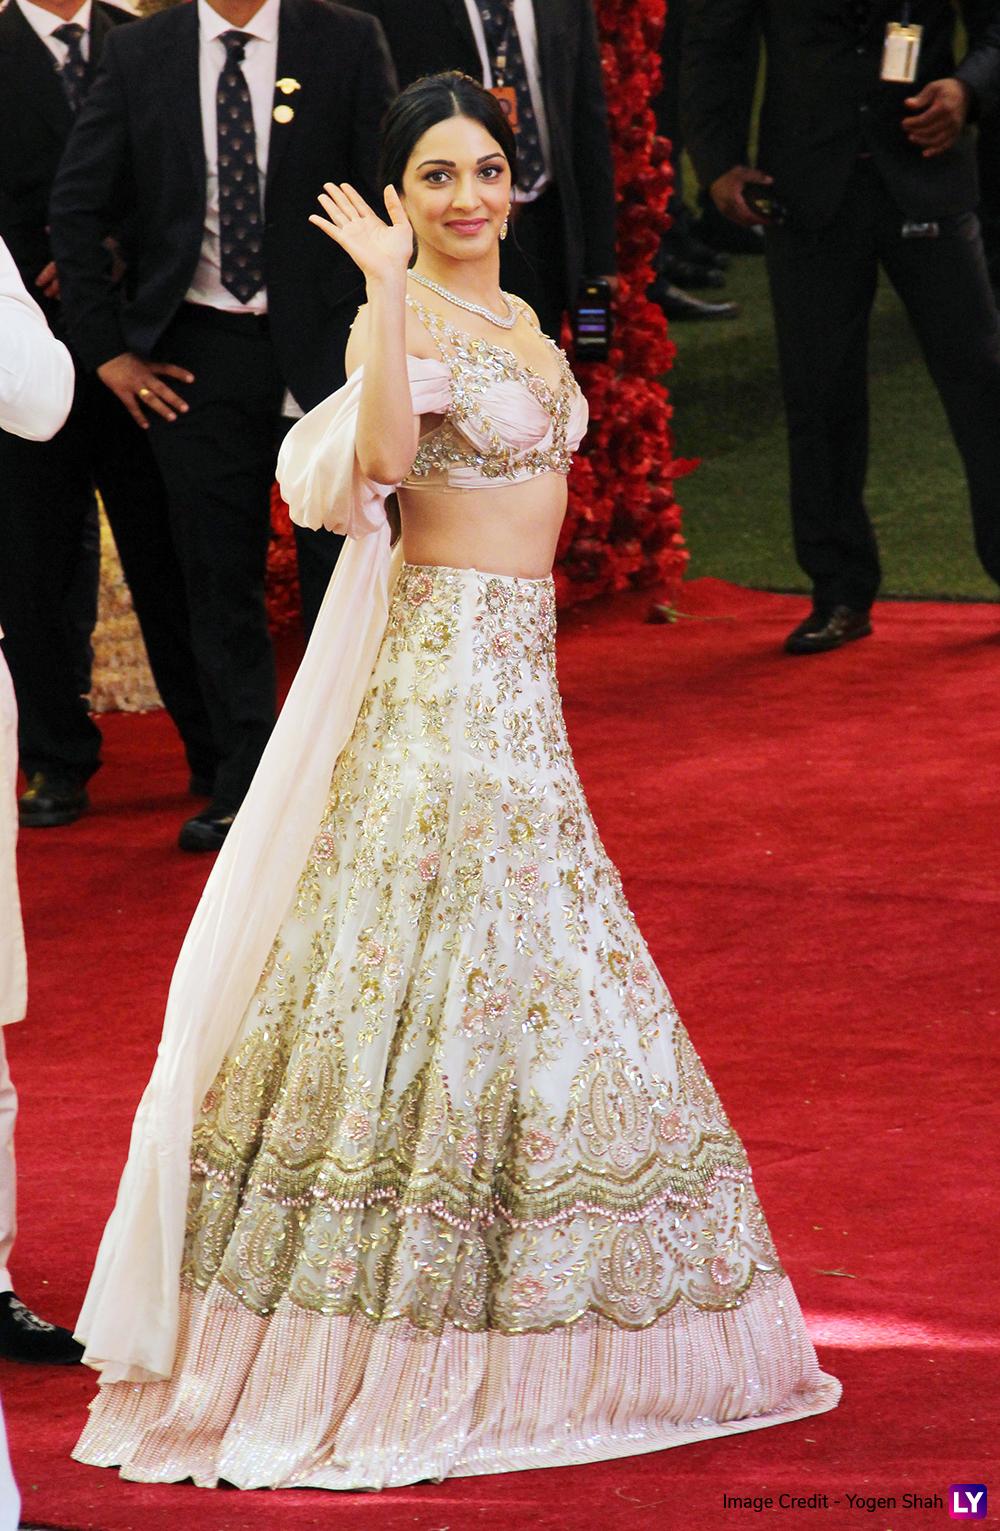 Isha Ambani-Anand Piramal Wedding LIVE Updates: Shah Rukh